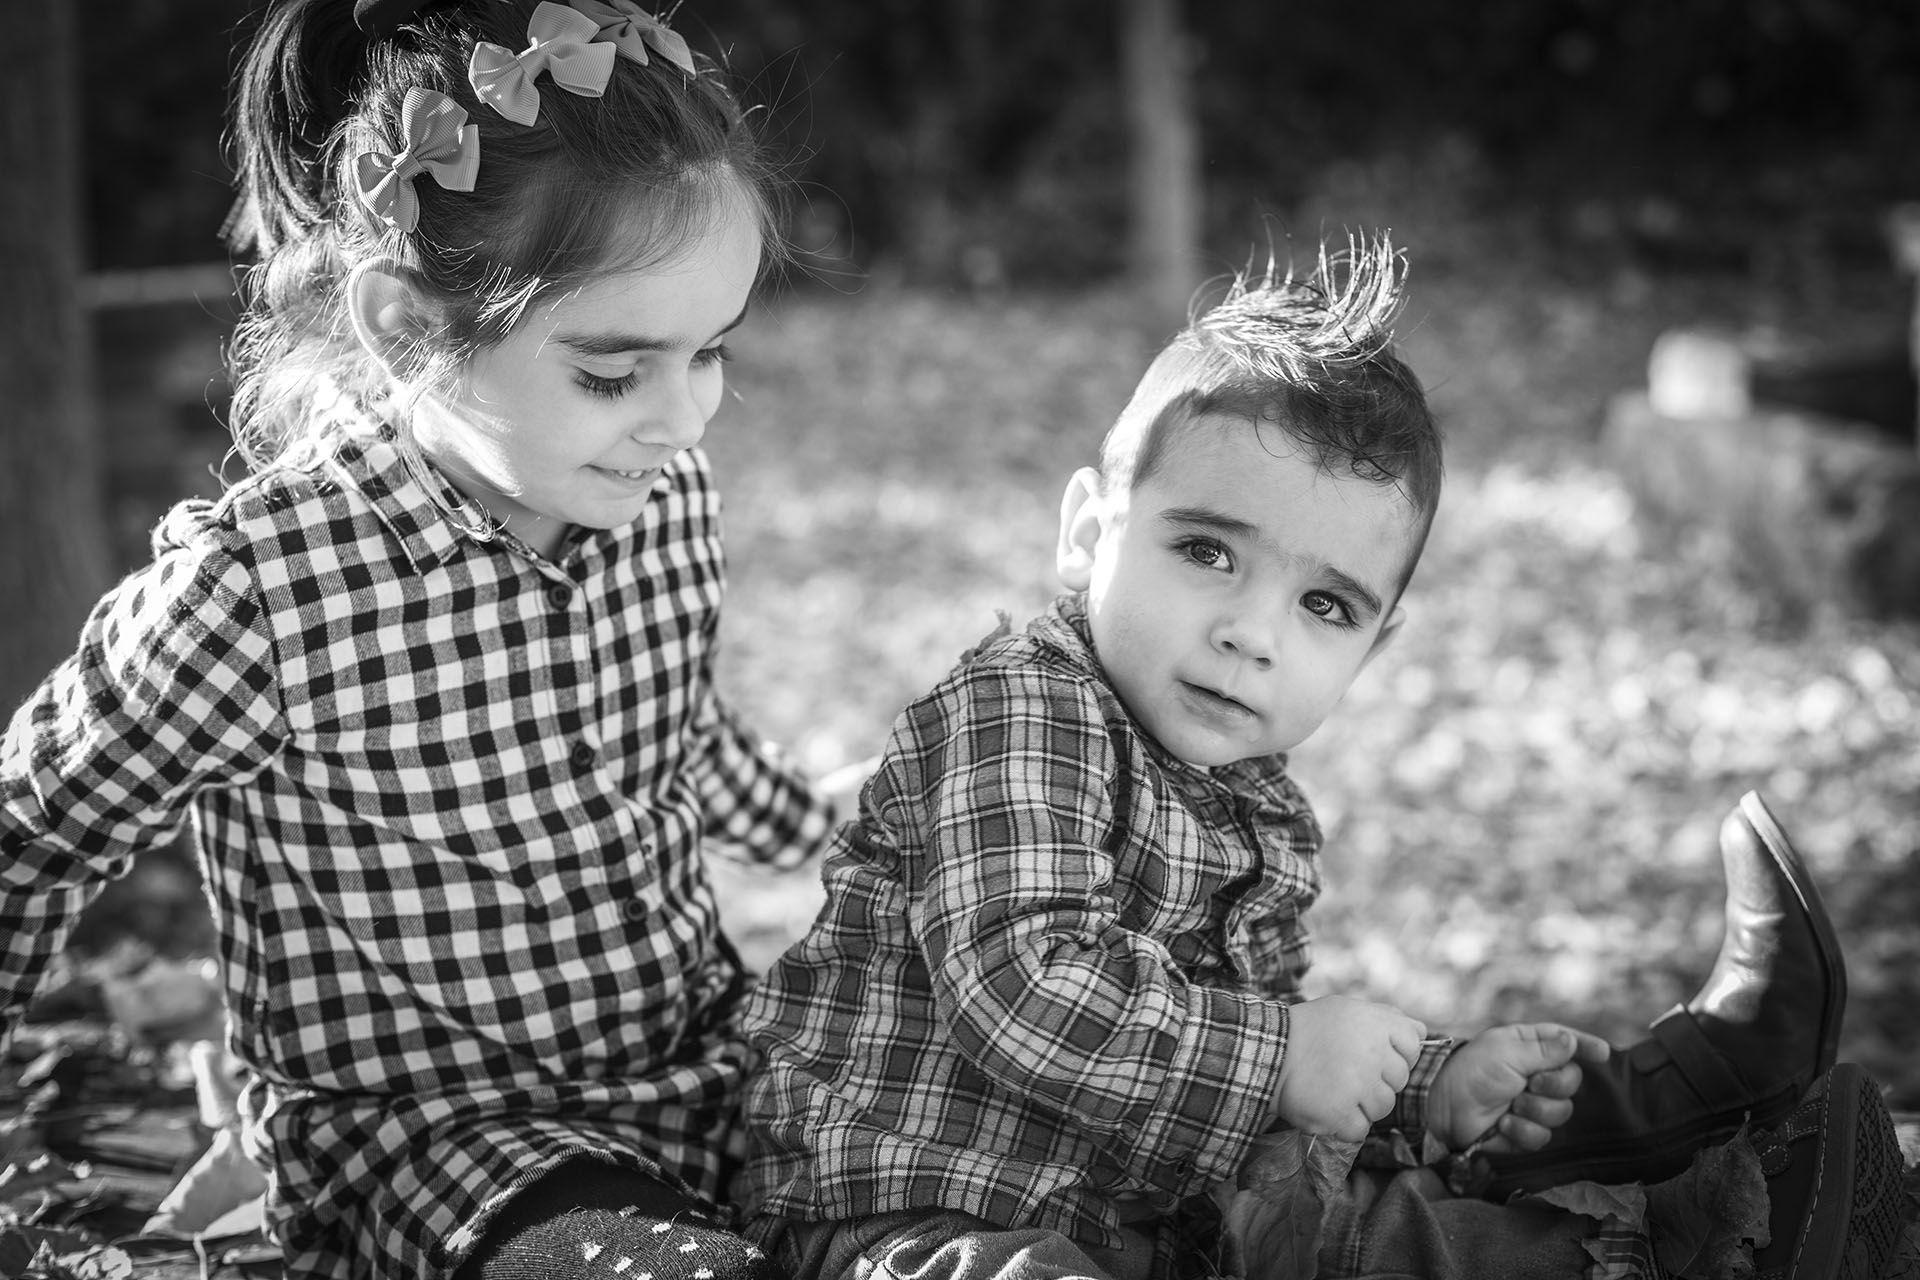 angela coronel-fotografia-sesion infantil-molina de aragon-ari izan